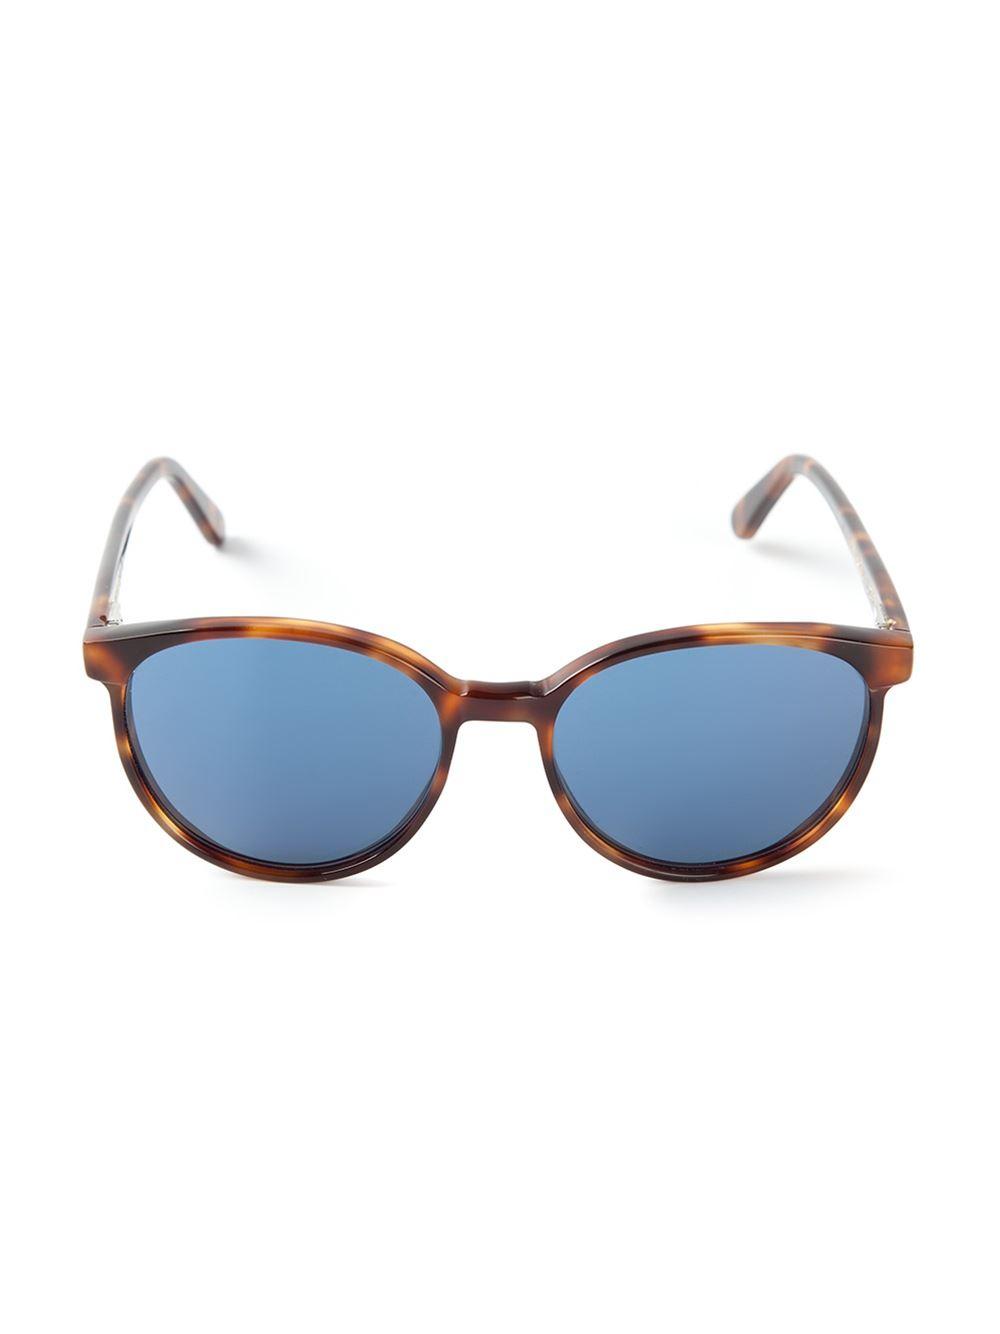 37a06731b28 Lgr Keren Sunglasses in Brown - Lyst